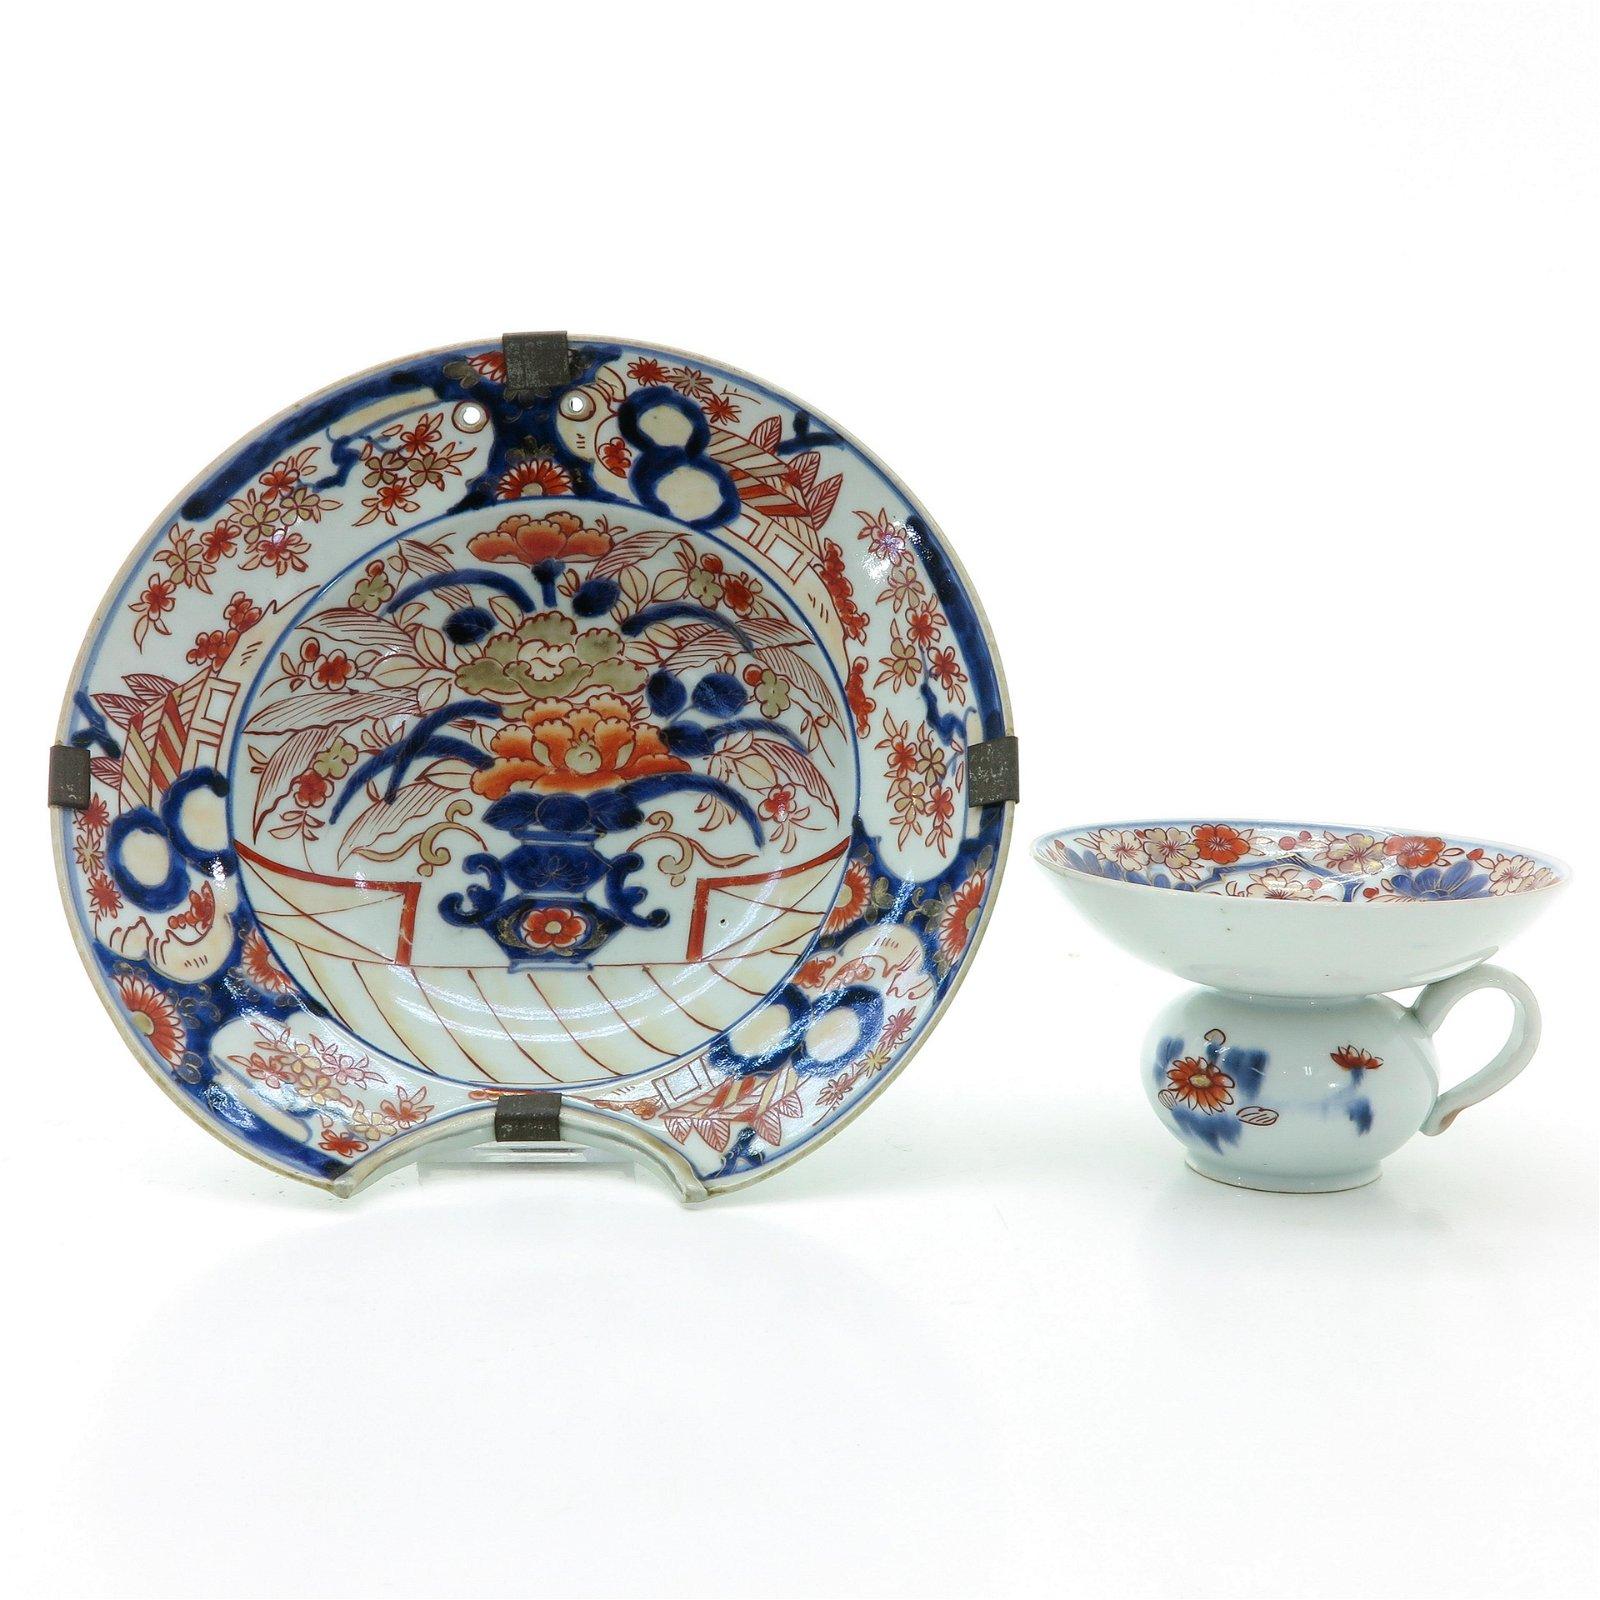 An Imari Shaving Bowl and Spitoon